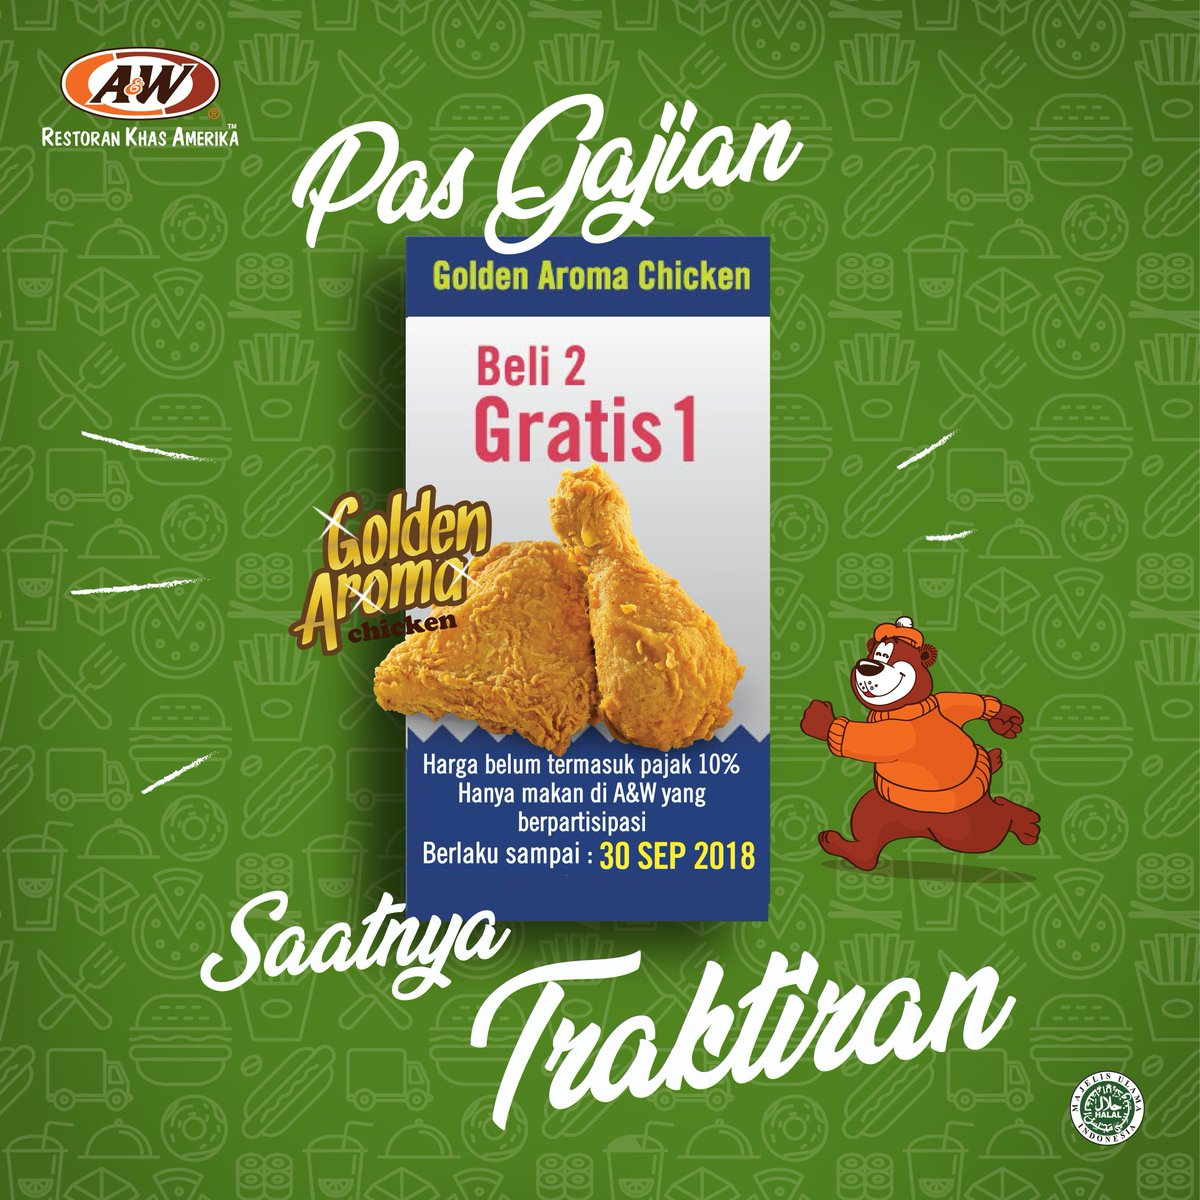 A&W - Promo Pas Gajian Beli 2 Gratis 1 (s.d 30 Sept 2018)